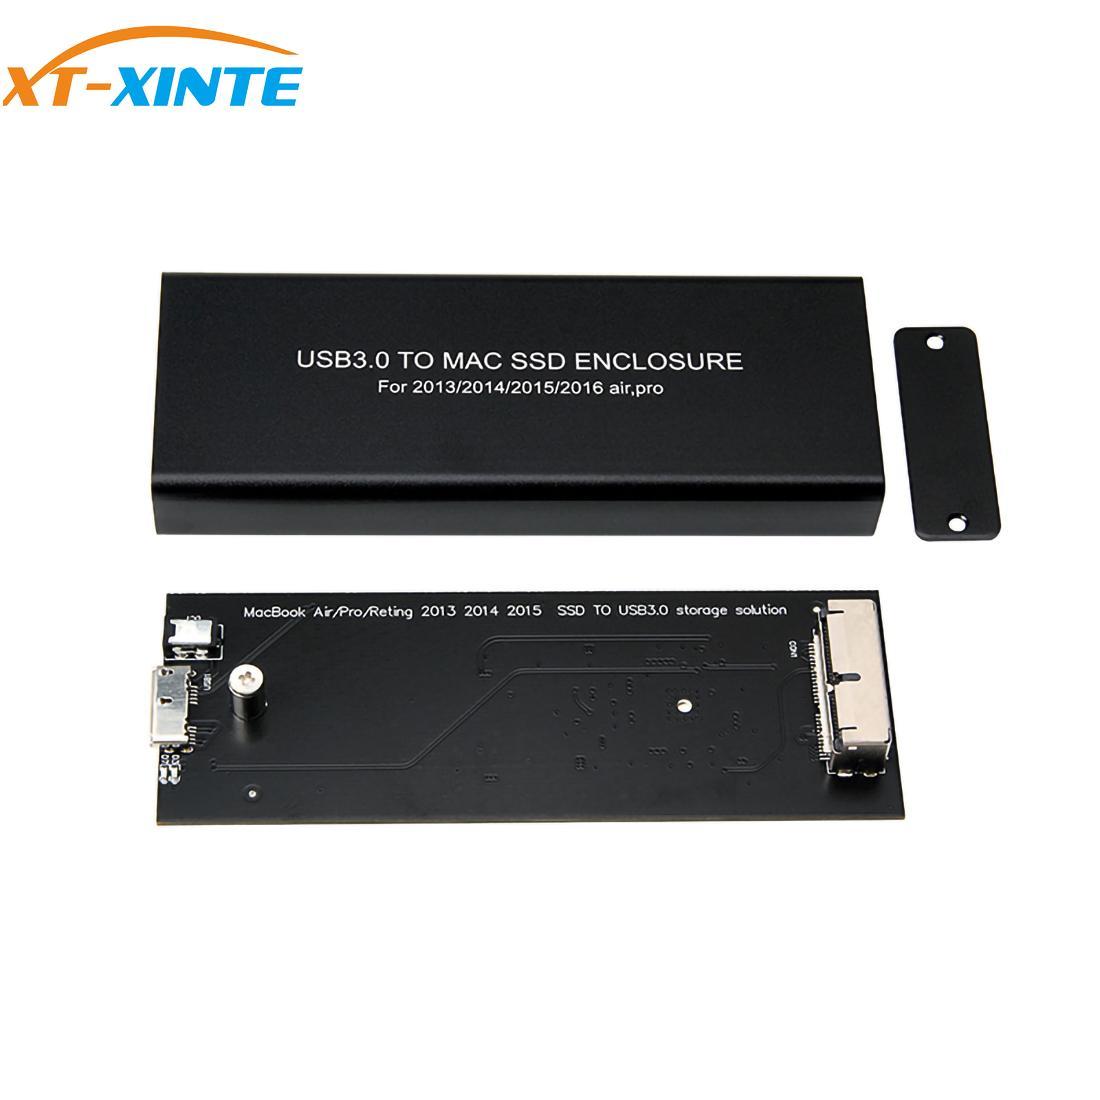 For Macbook Air Pro Retina 2013 2014 2015 2016 2017 Hard Disk Box A1466 A1465 A1398 A1502 USB 3.0 for Mac SSD Enclosure HDD Case(China)